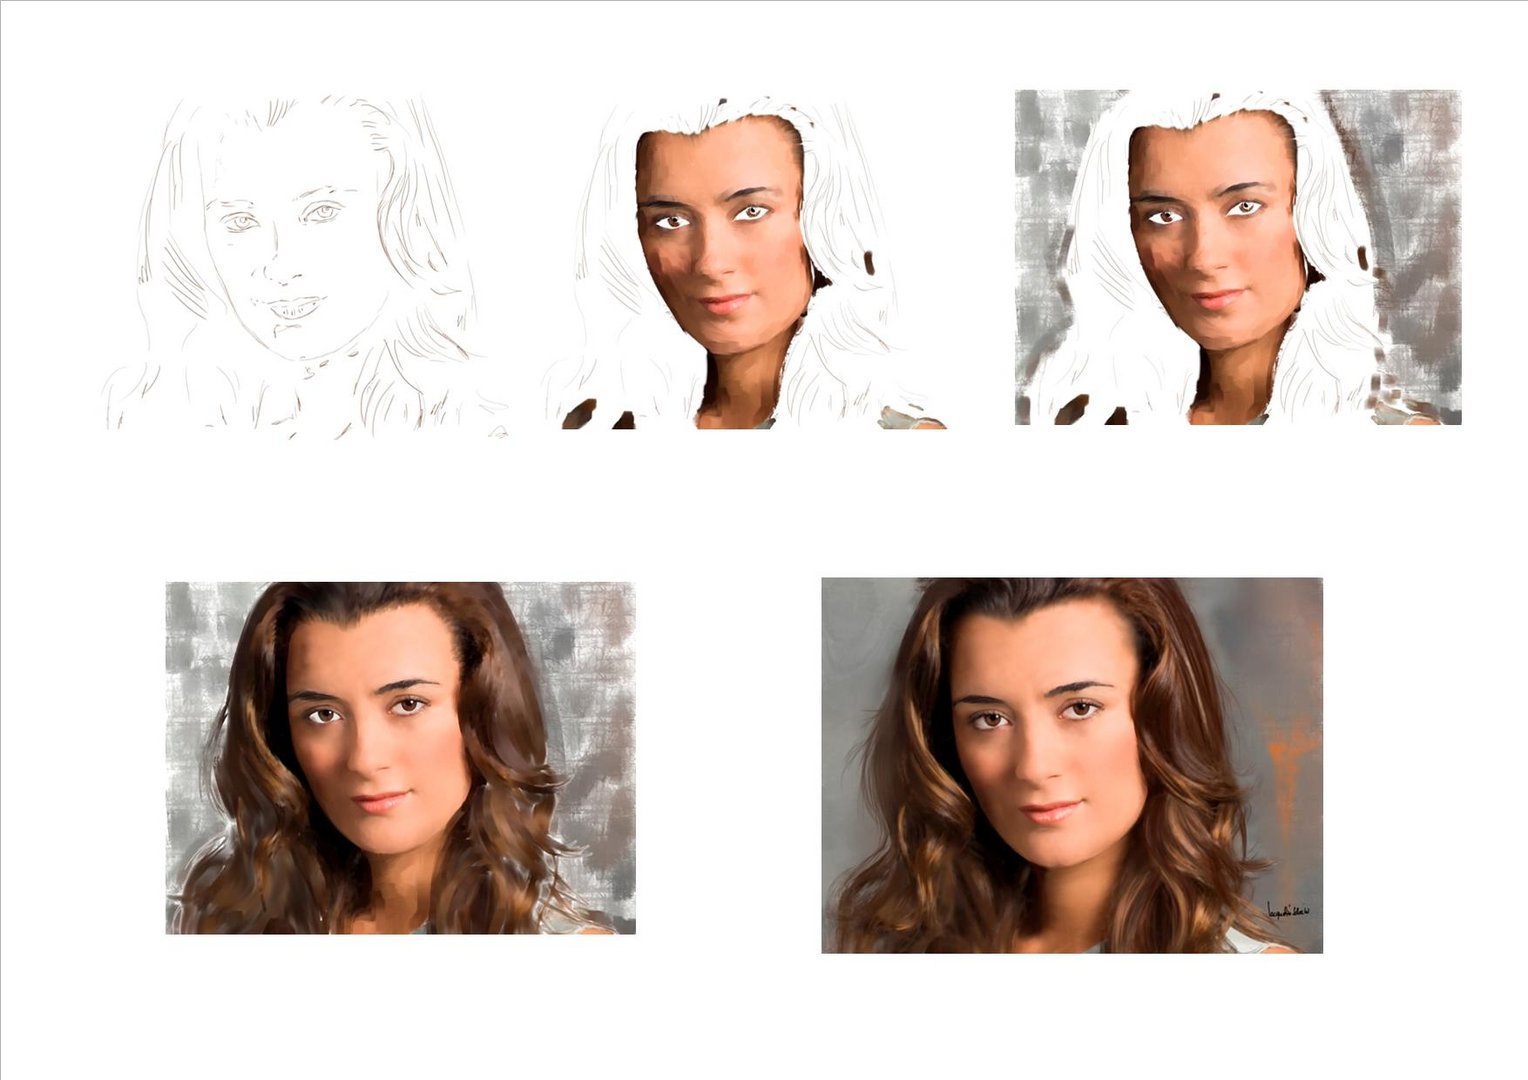 wip - digital painting ziva